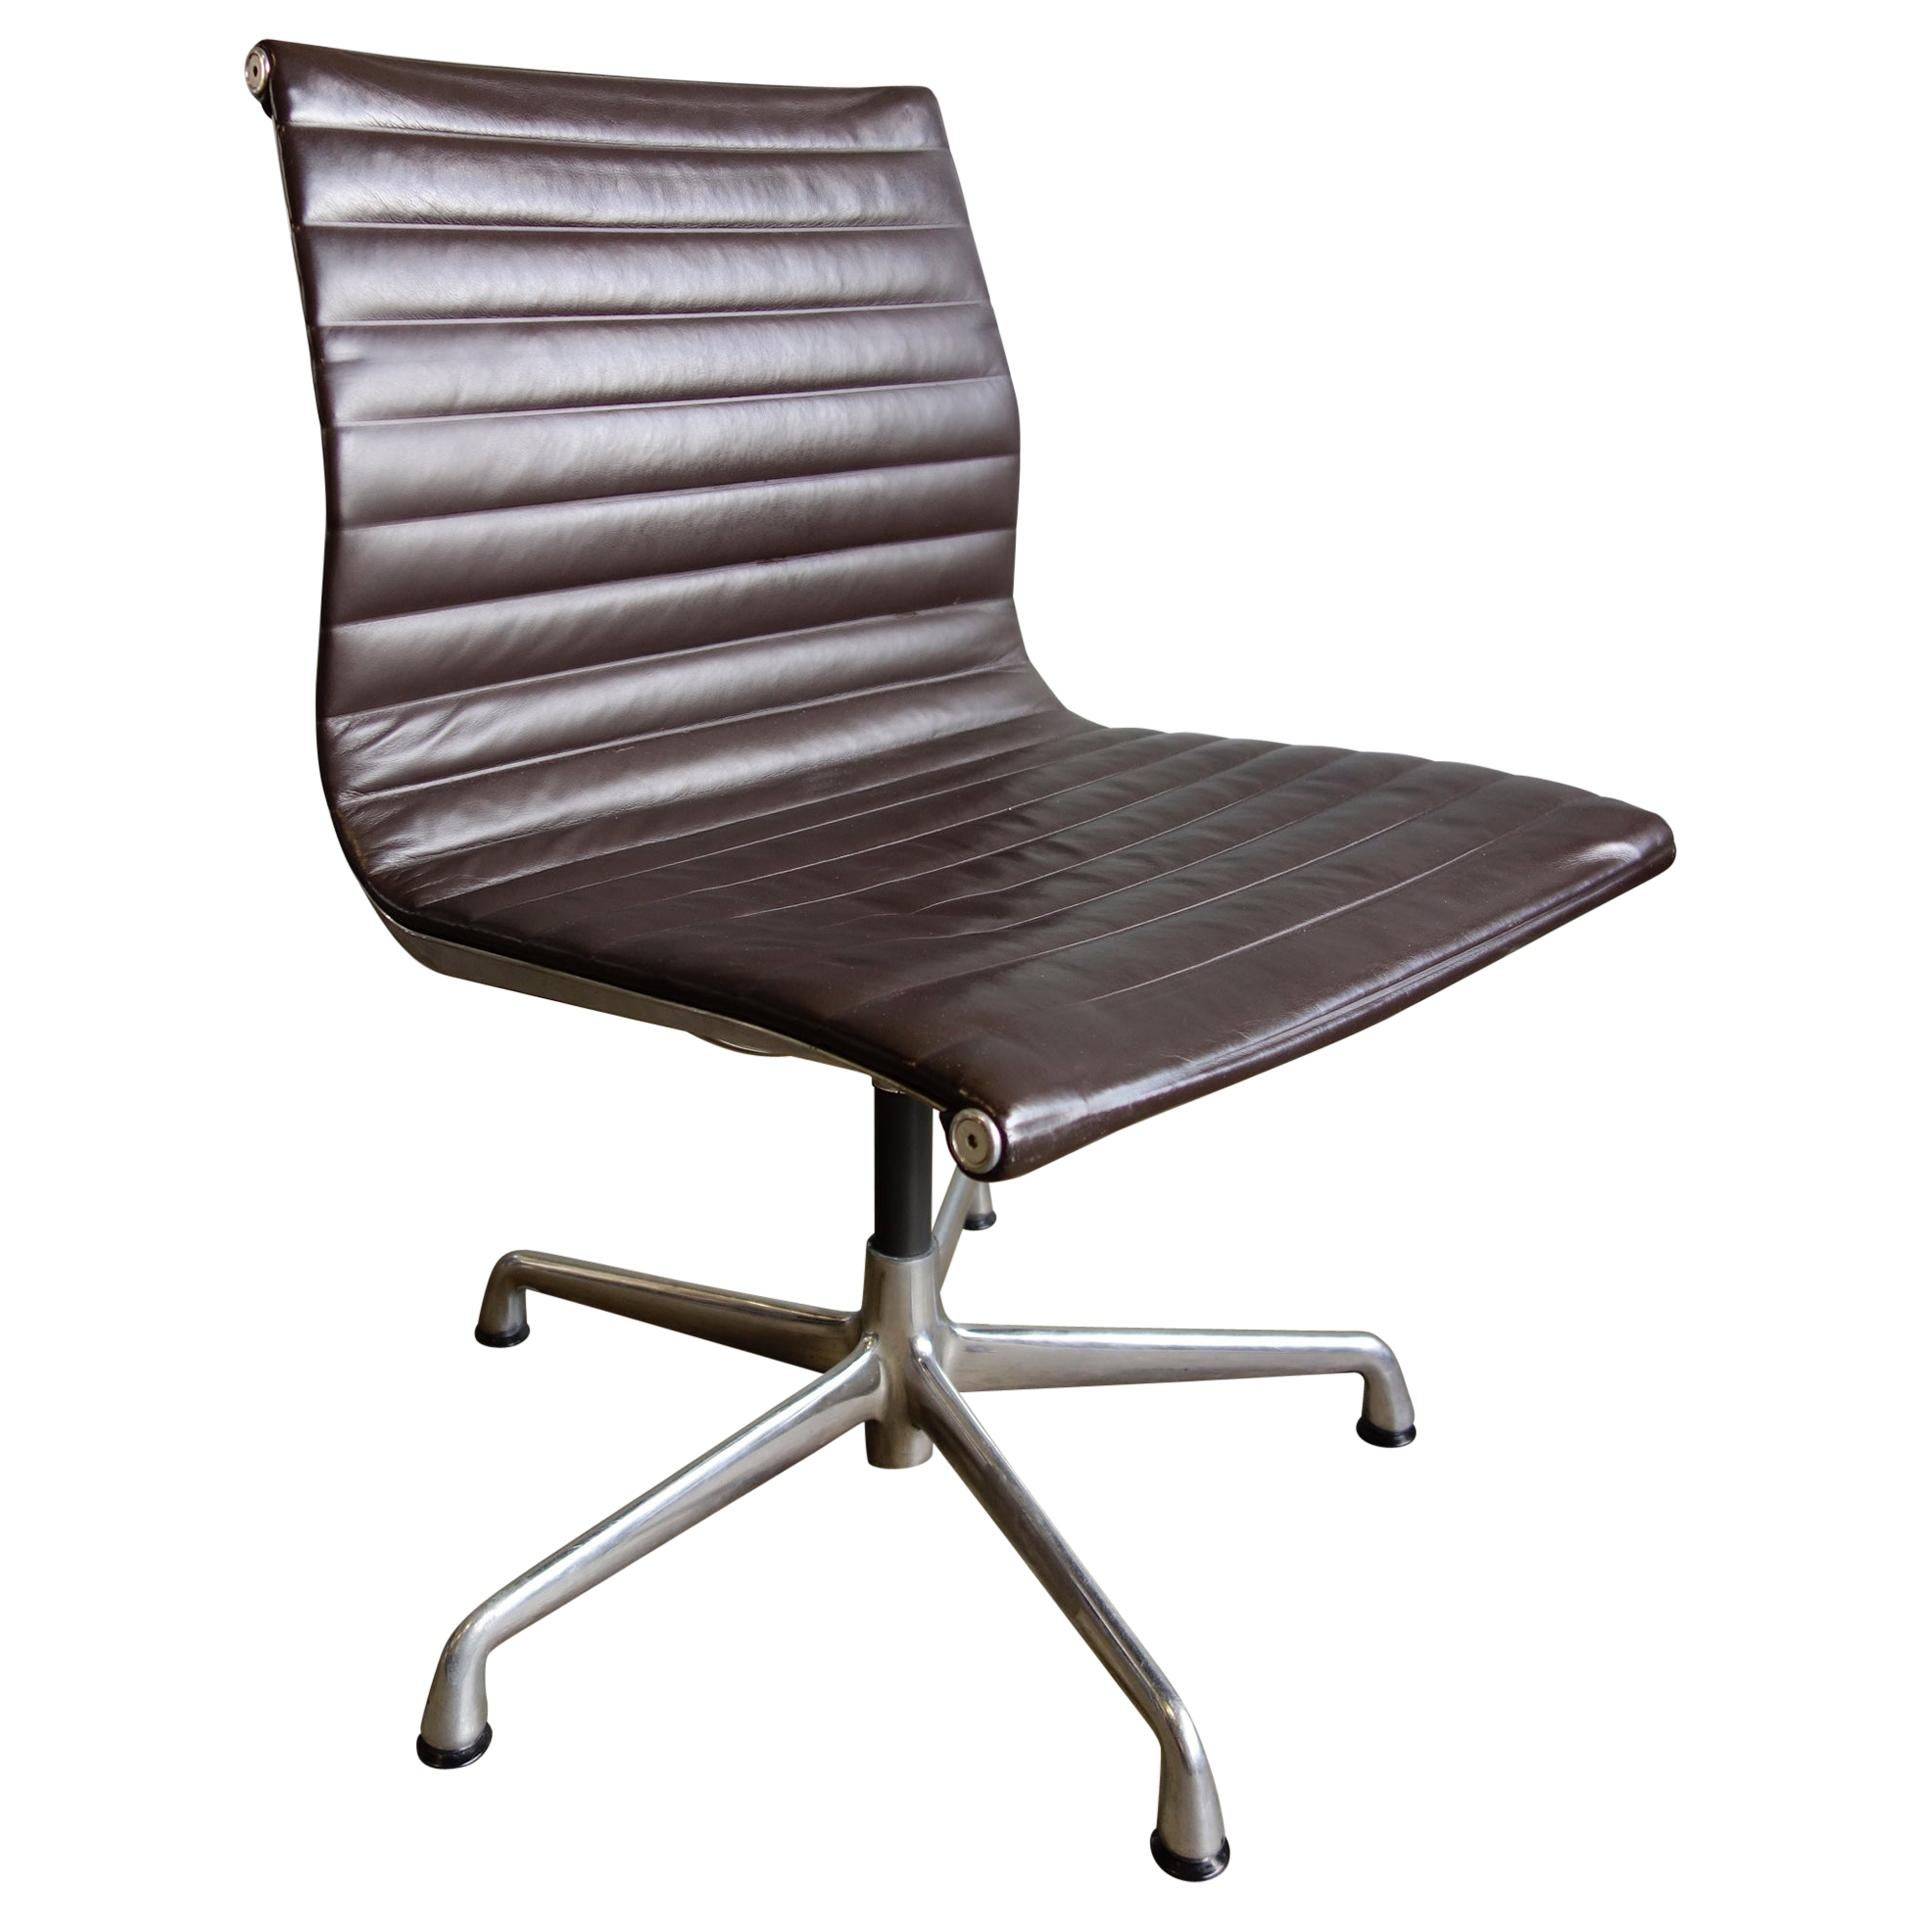 Midcentury Eames Aluminum Group Side Chair for Herman Miller